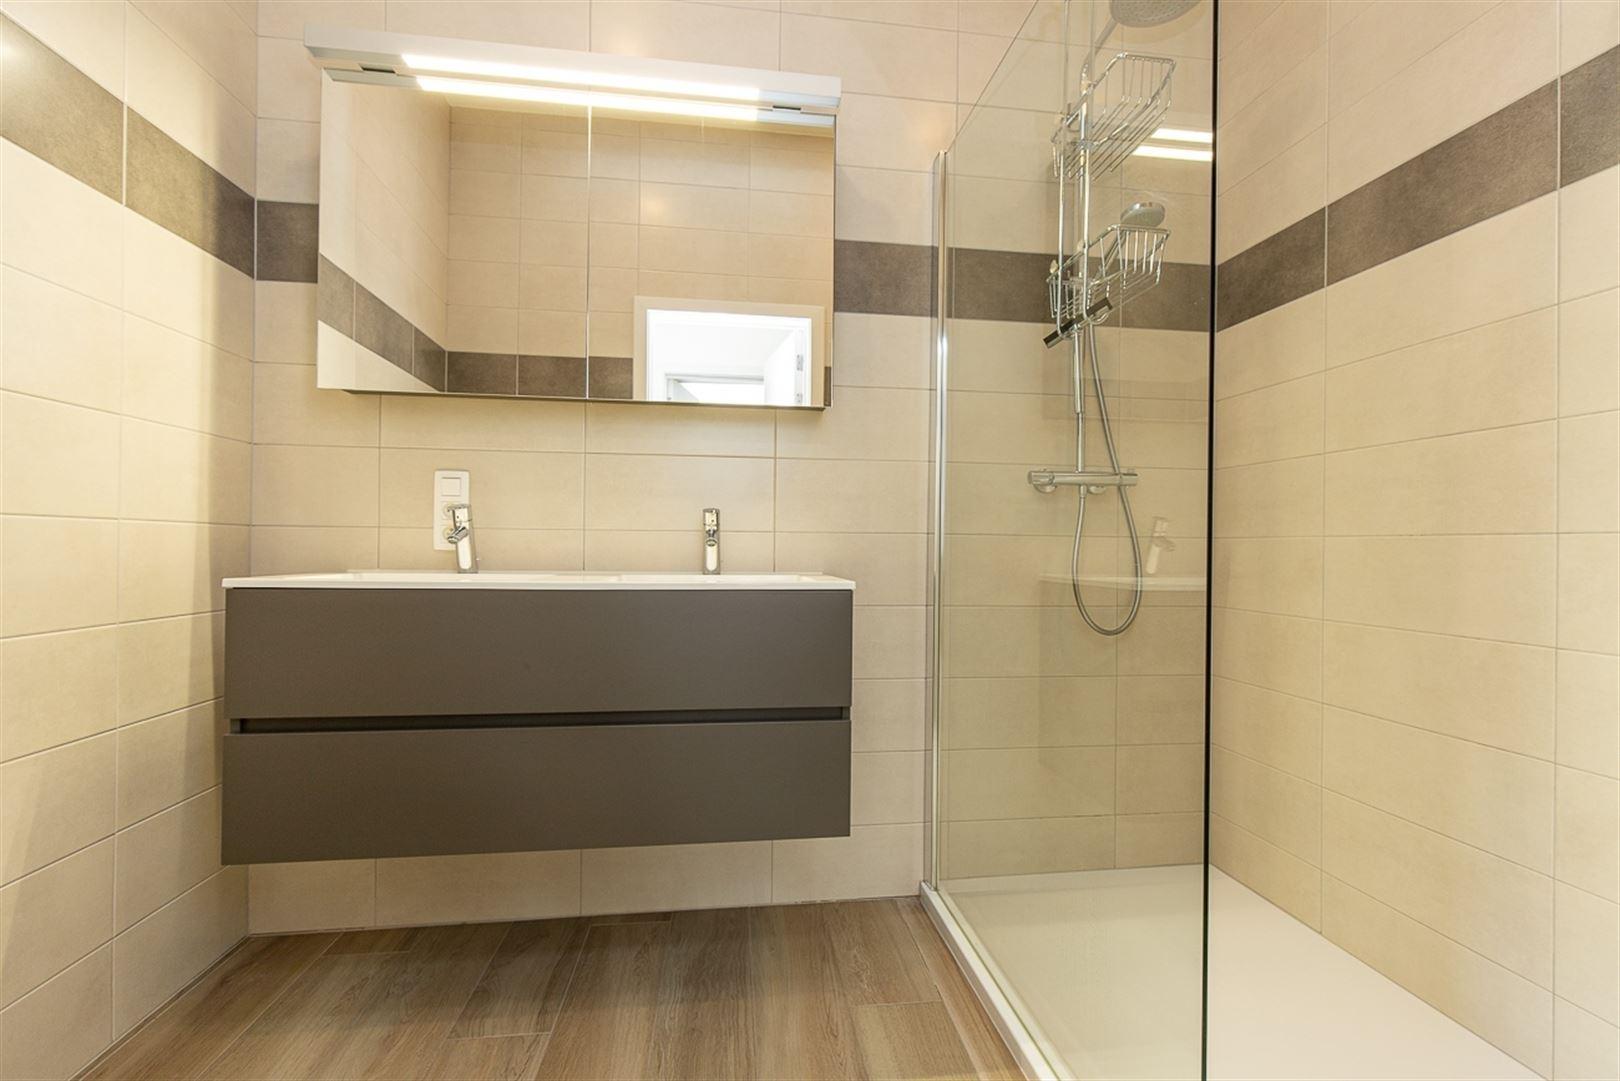 Foto 13 : Appartement te 9200 DENDERMONDE (België) - Prijs € 299.000